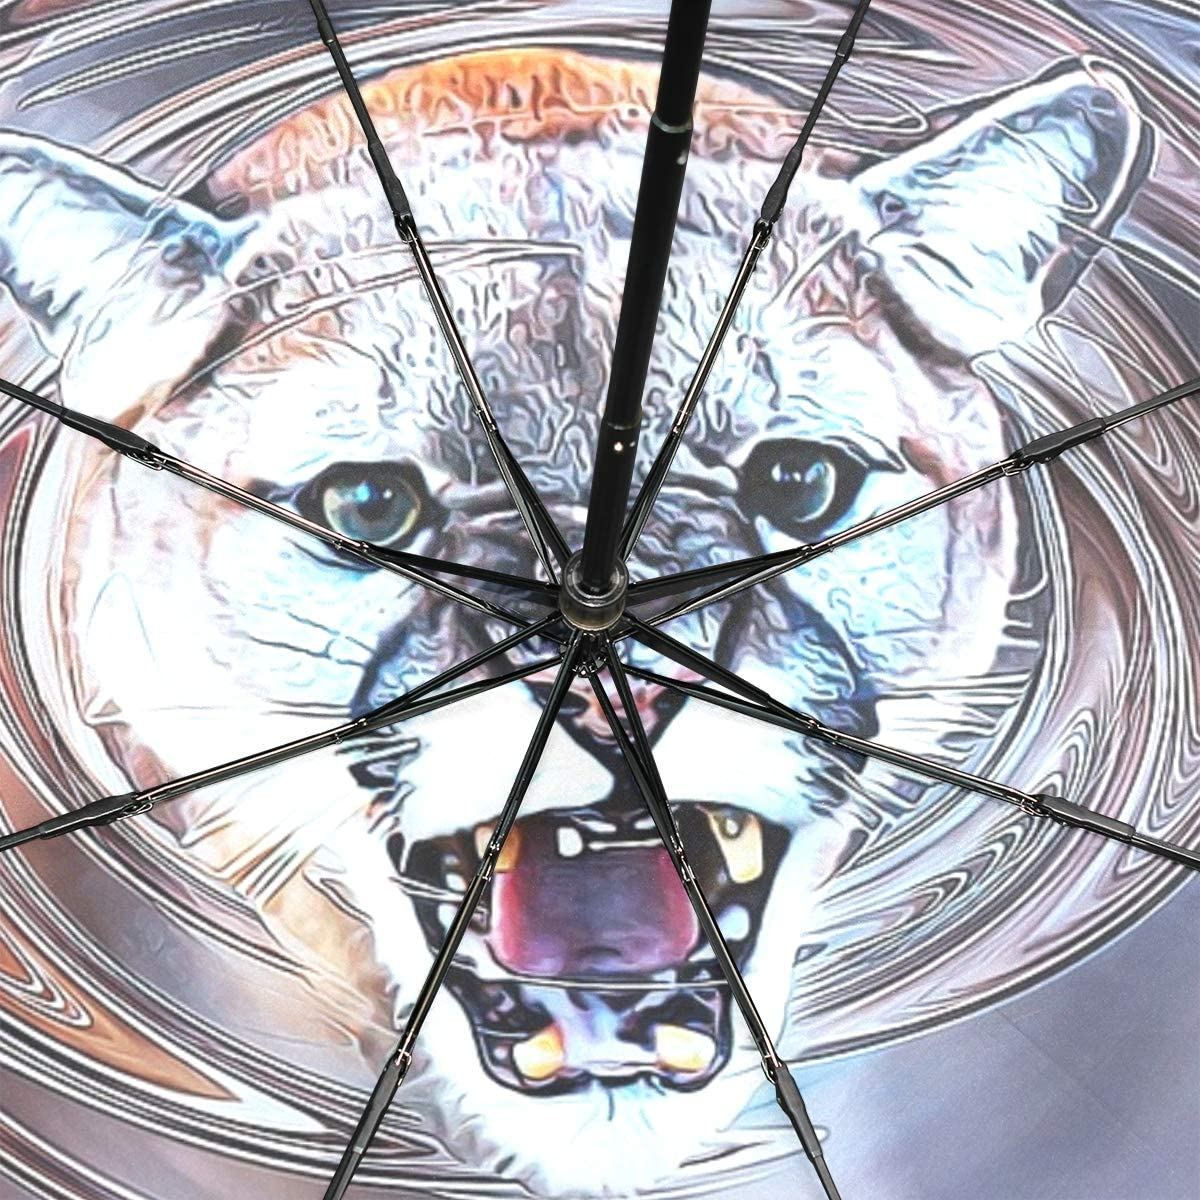 Umbrella Kids Girls Cougar Animal Art Swirl Decorative Page Portable Compact Folding Umbrella Anti Uv Protection Windproof Outdoor Travel Women Umbrella Double Layer Inverted